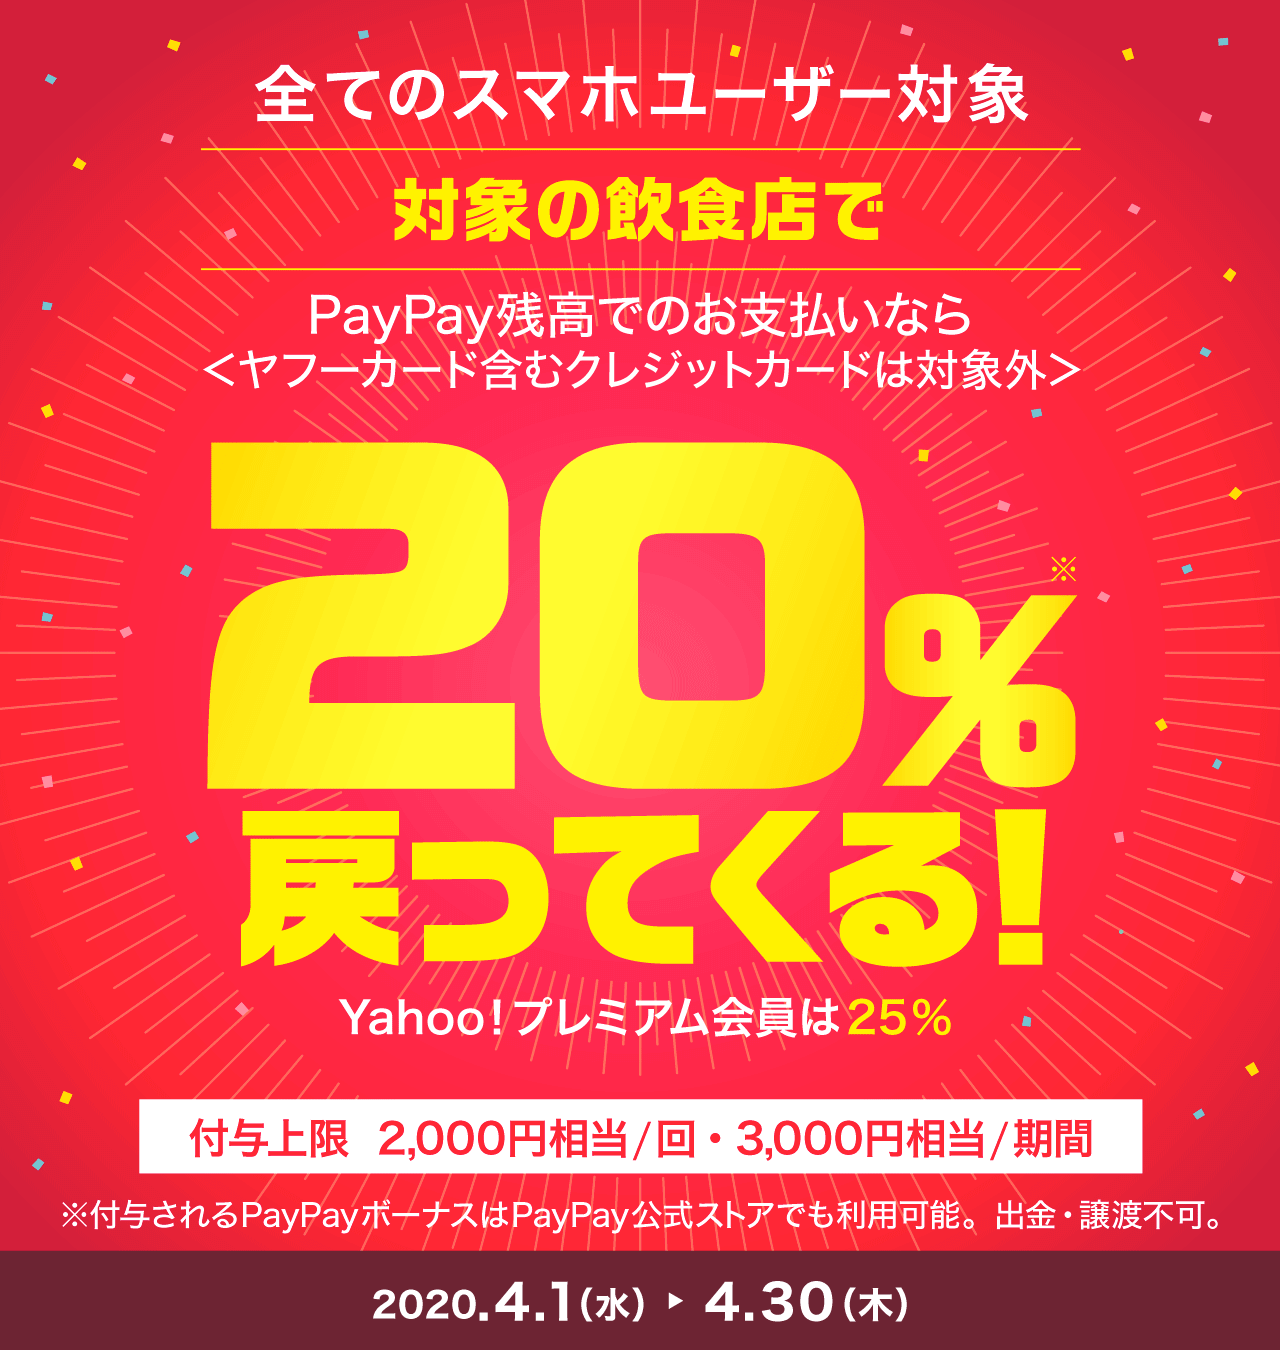 PayPay20%還元キャンペーン